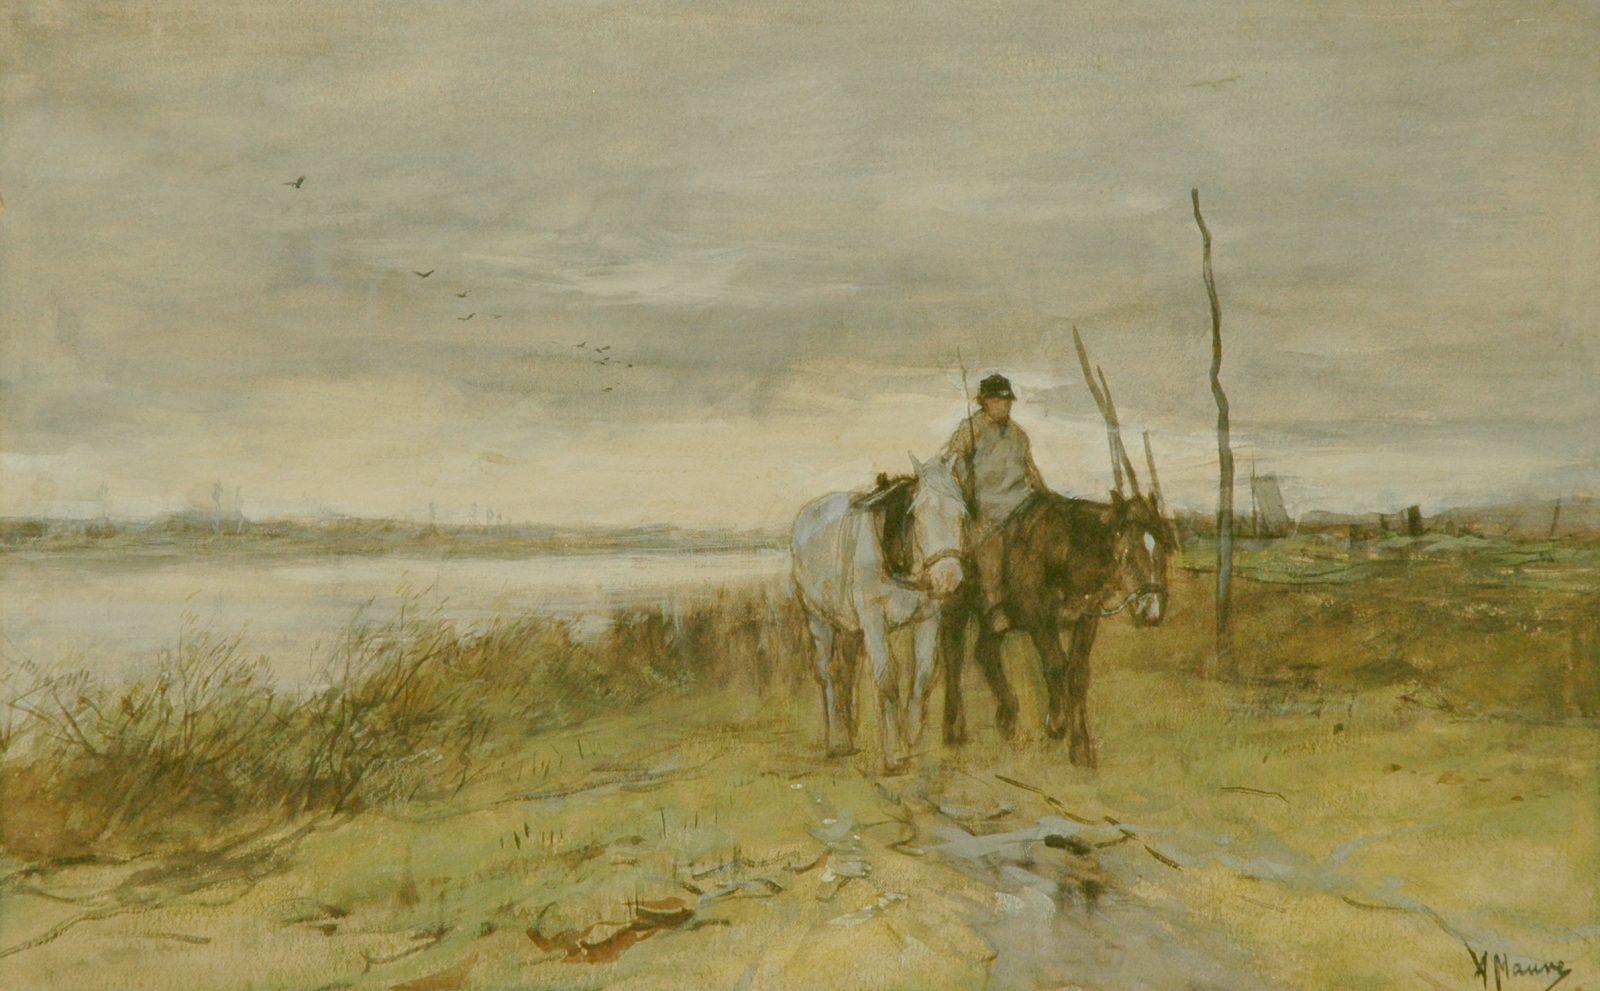 Mauve A. - Horses along a towpath, watercolour on paper 27 x 42.1 cm, signed l.r.